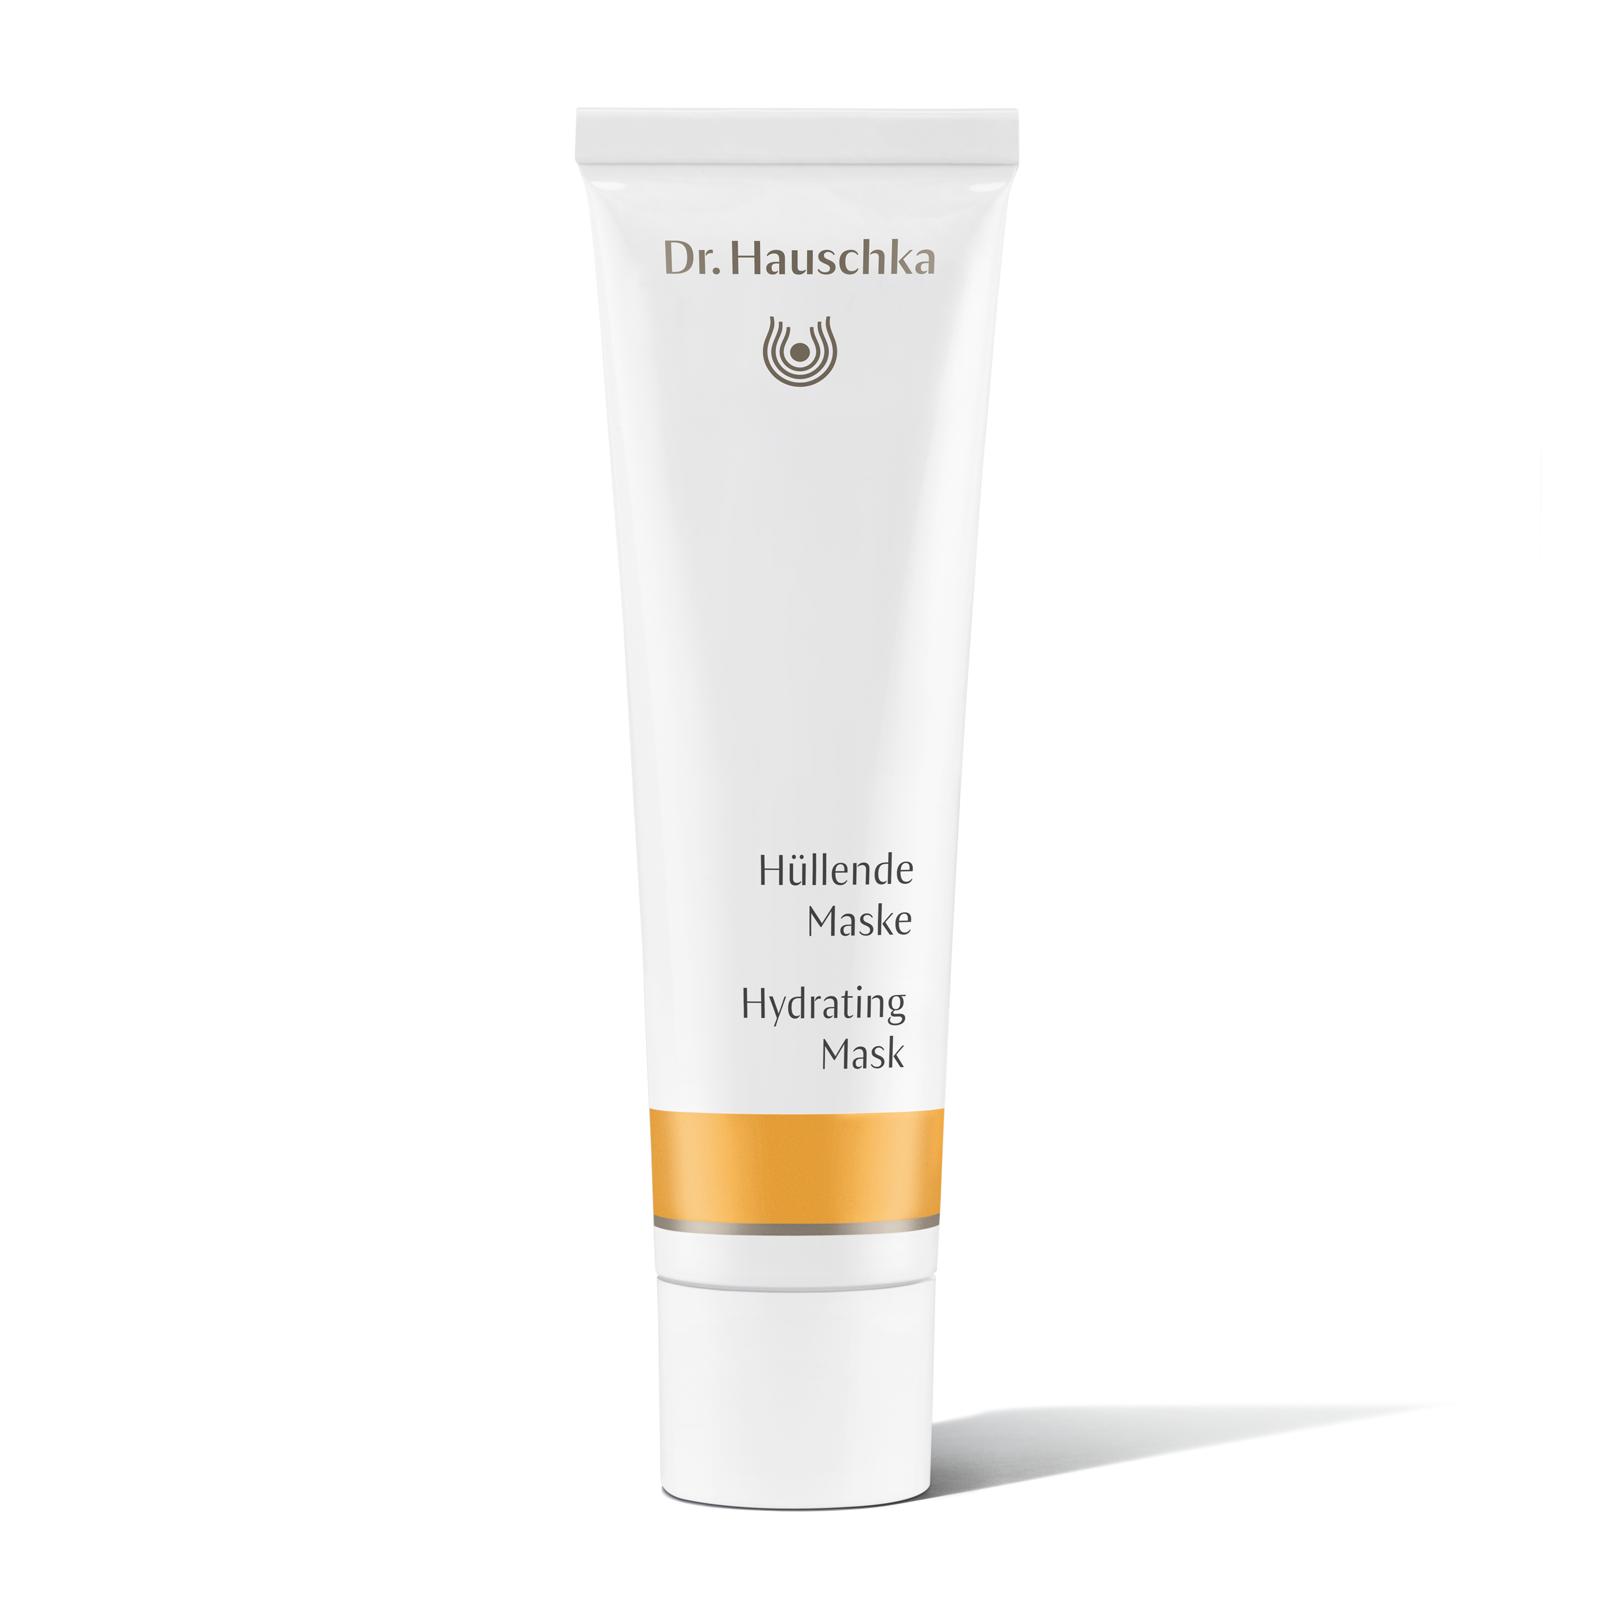 Dr. Hauschka - Masca hidratanta